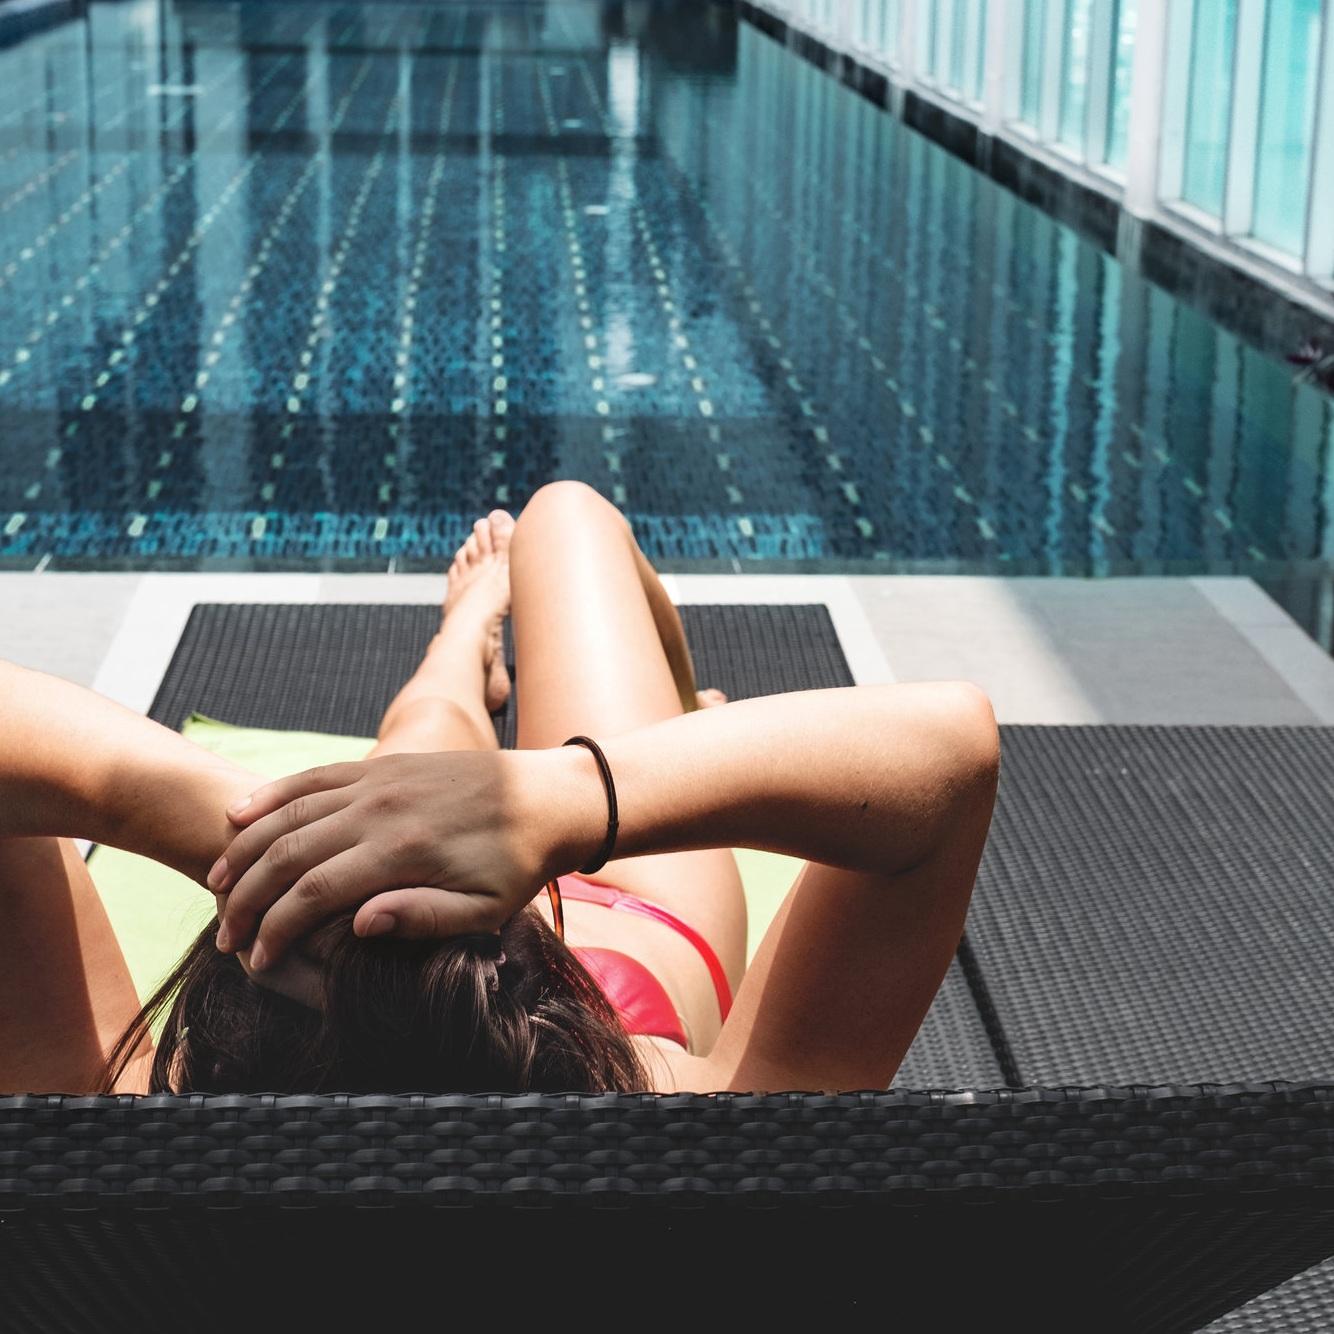 Sun-Bed Tanning -